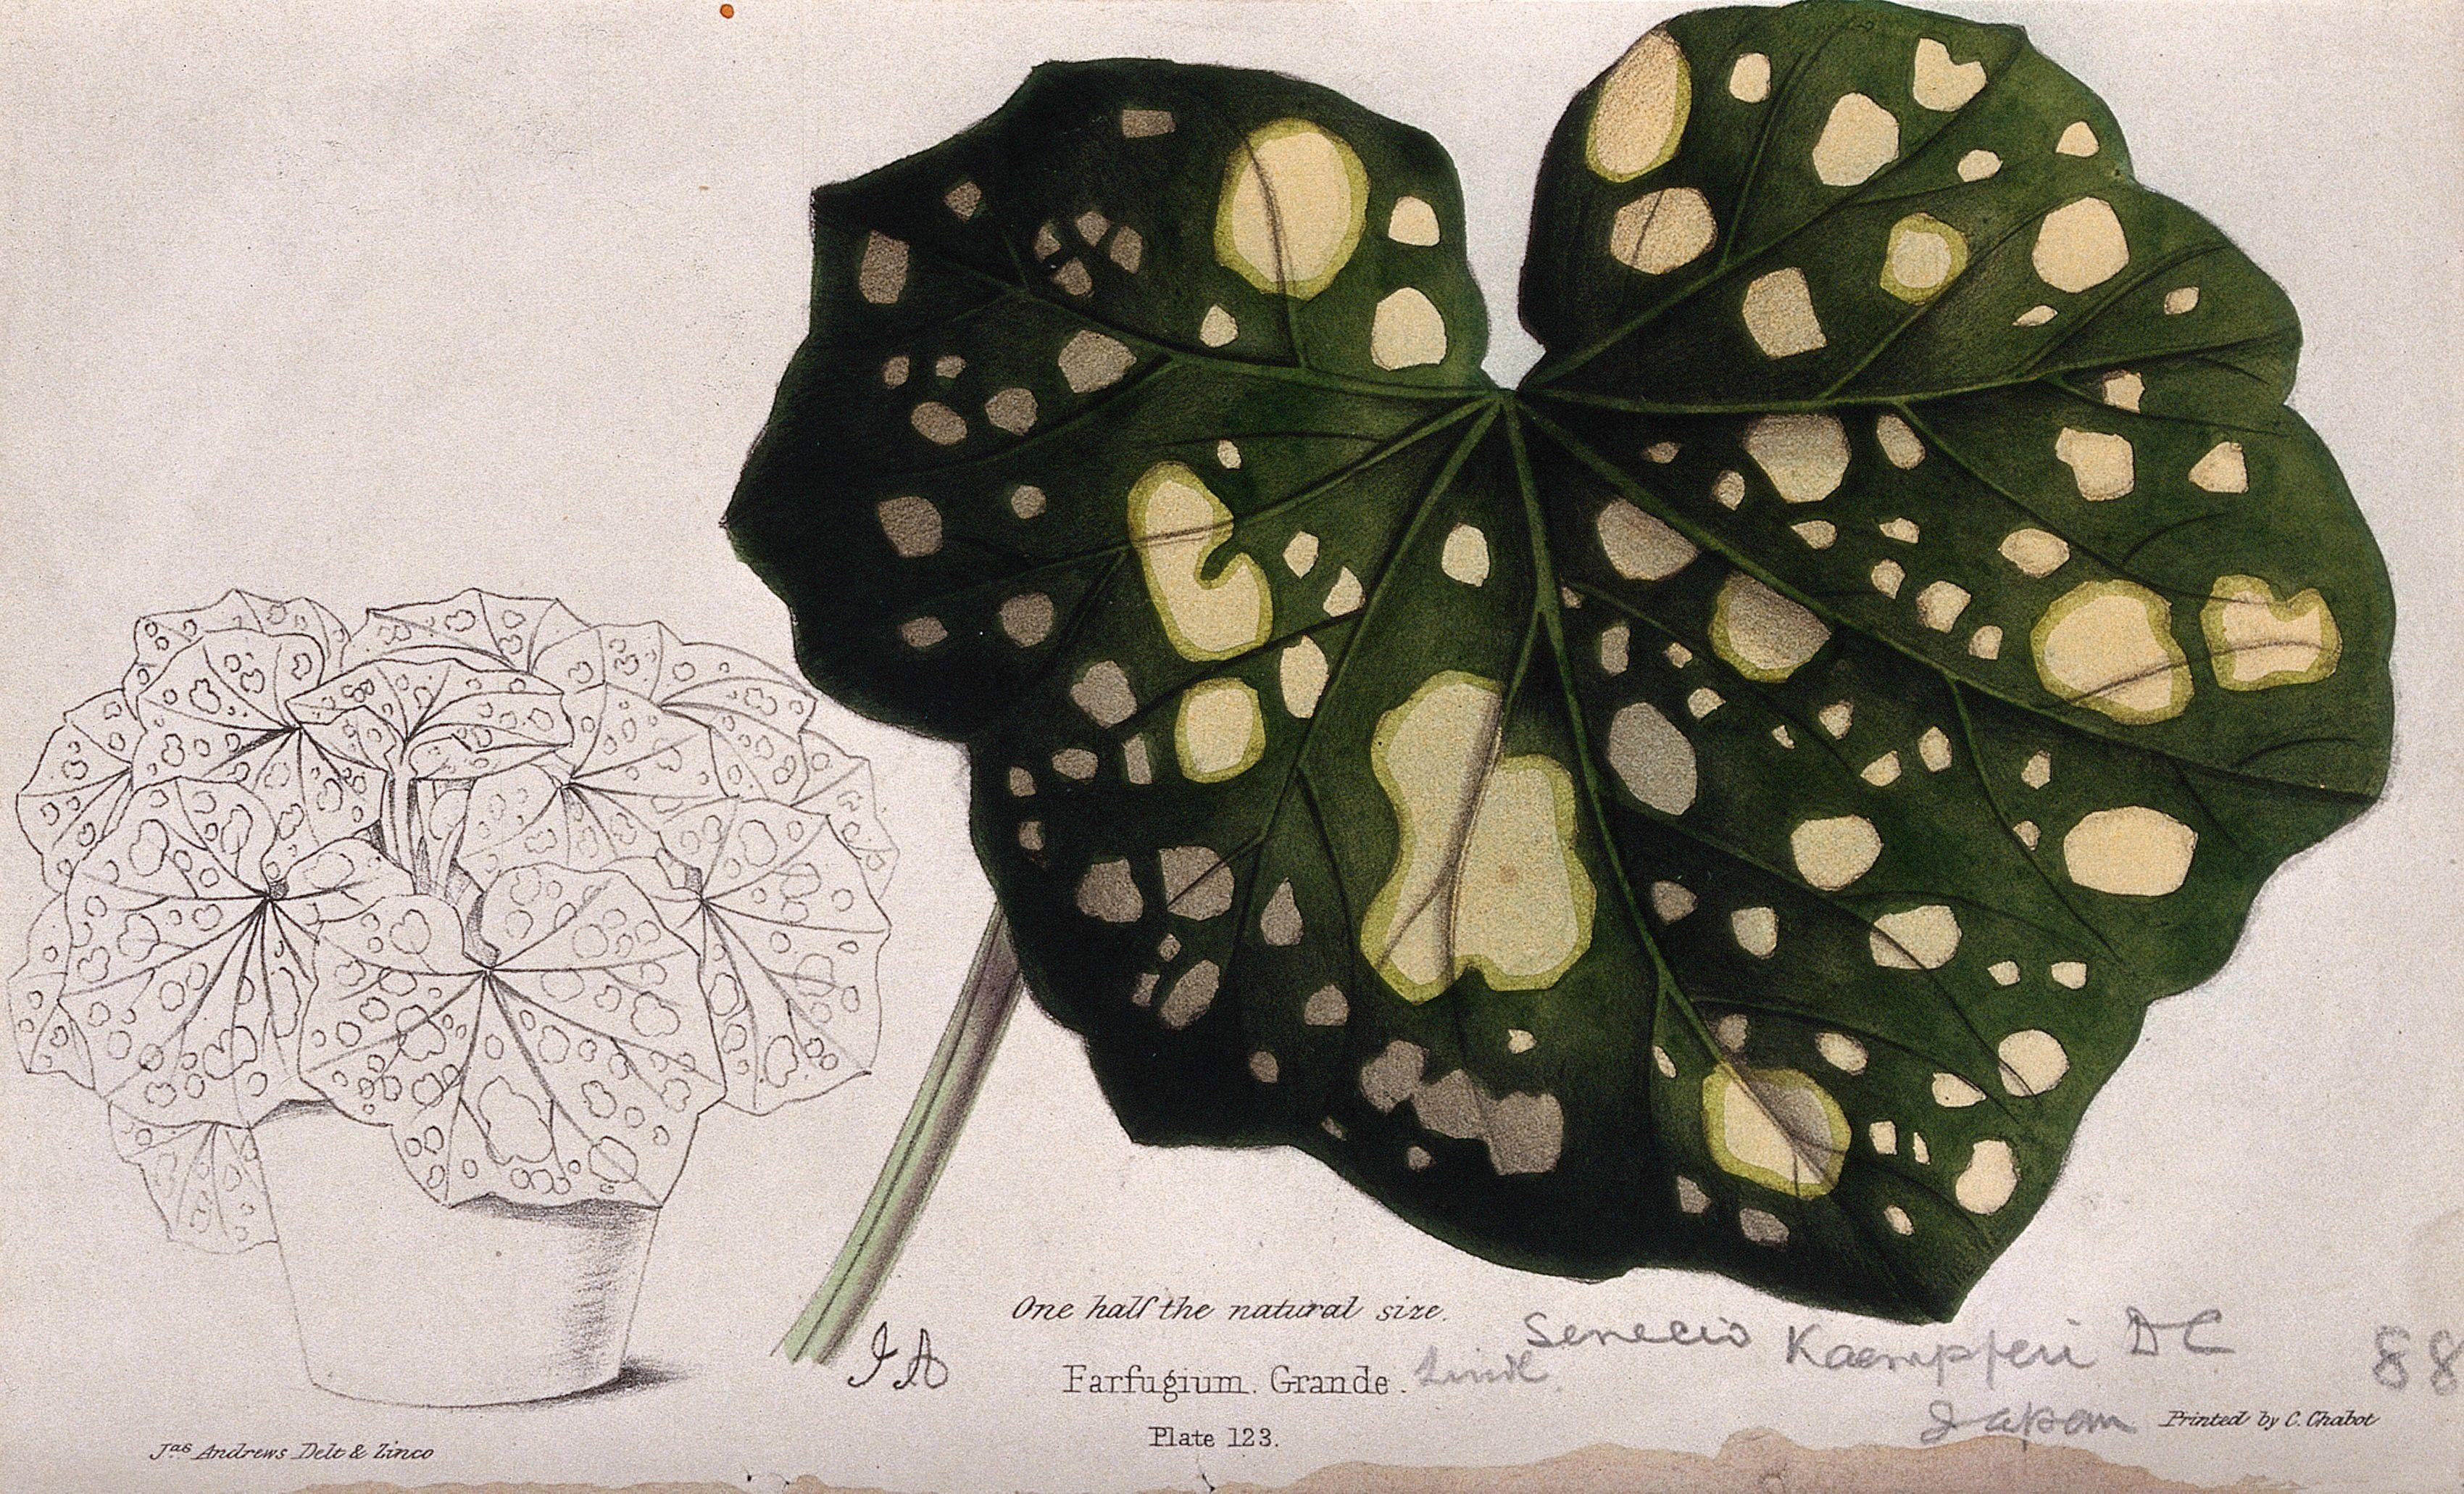 A plant (Senecio kaempferi)  variegated leaf and entire potted plant.  Coloured zincograph by J. Andrews afca4e49169